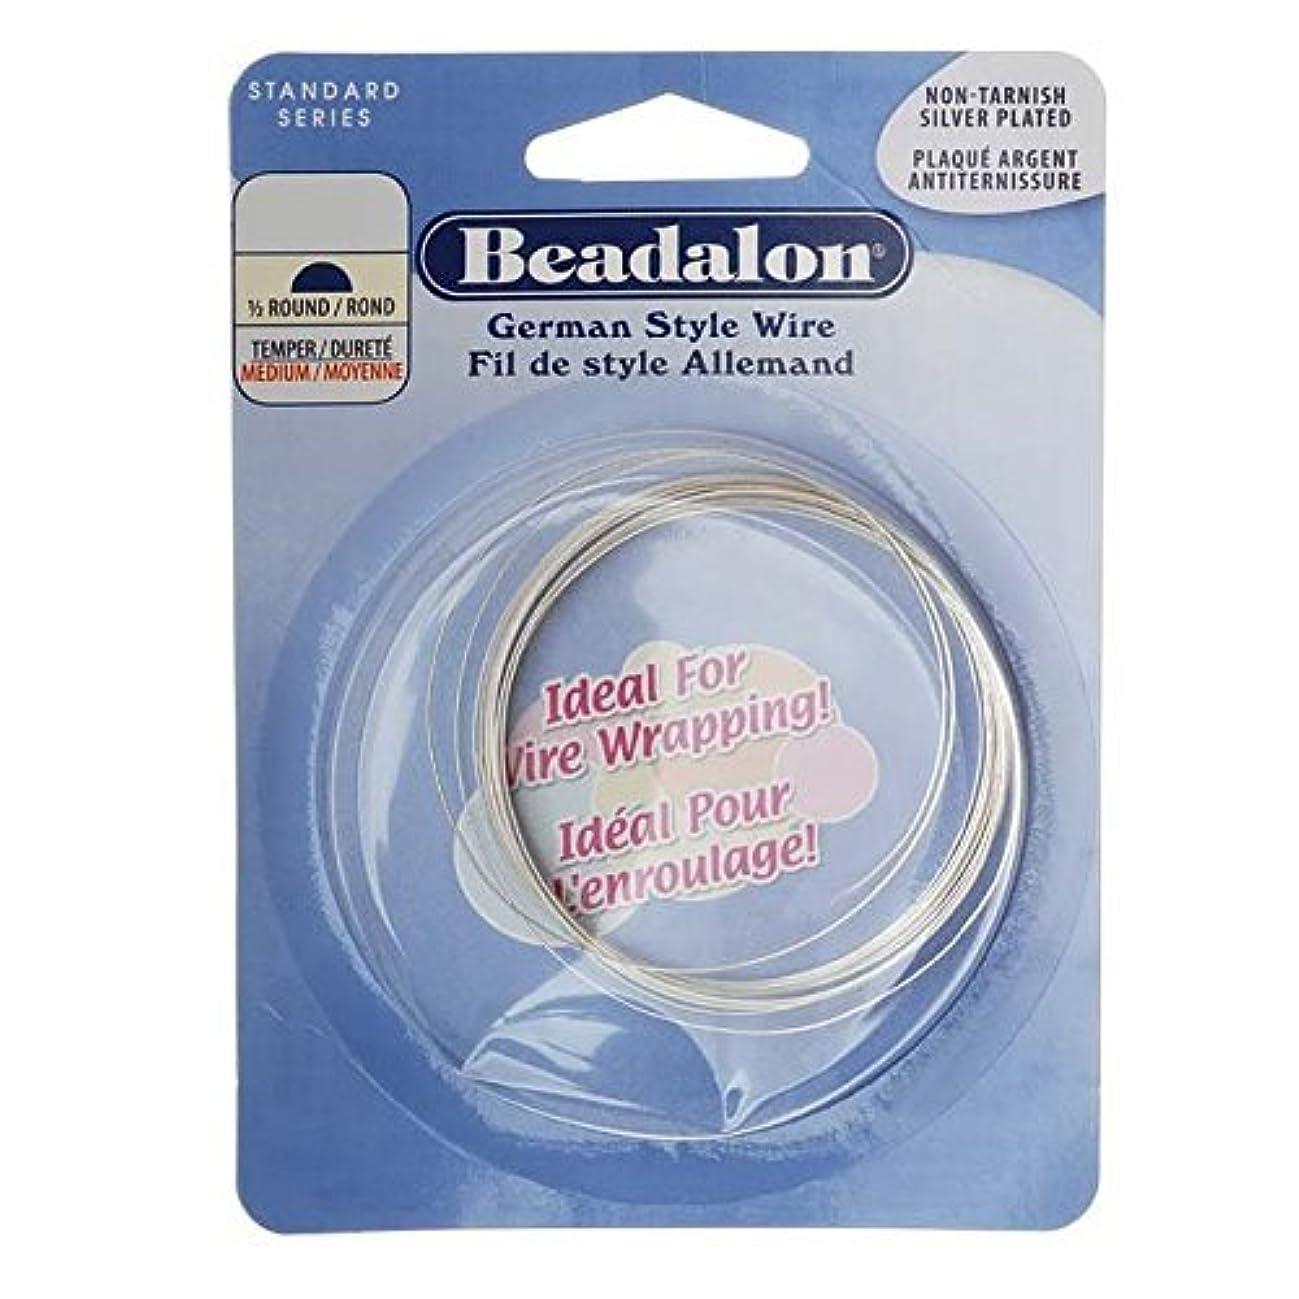 Beadalon German Style Wire, Half Round, Tarnish Resisitant Silver Plated, 22 Gauge, 5-Meters